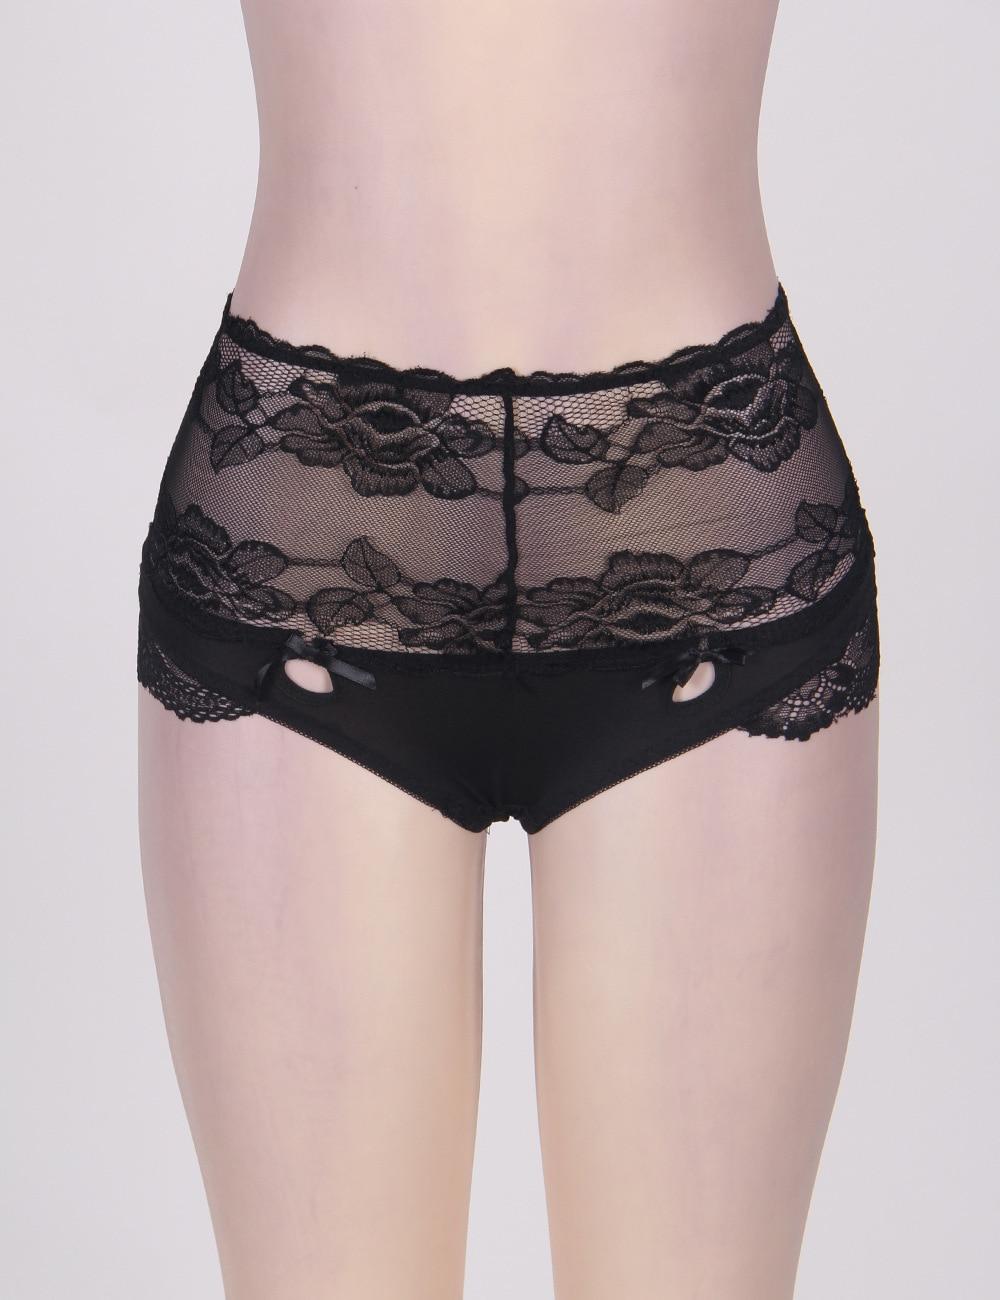 Hot Plus Size Open Crotch Lace Panties Underwear High Waist Thongs Lady Panty Tangas Bandage Transparent Lingerie briefs Women